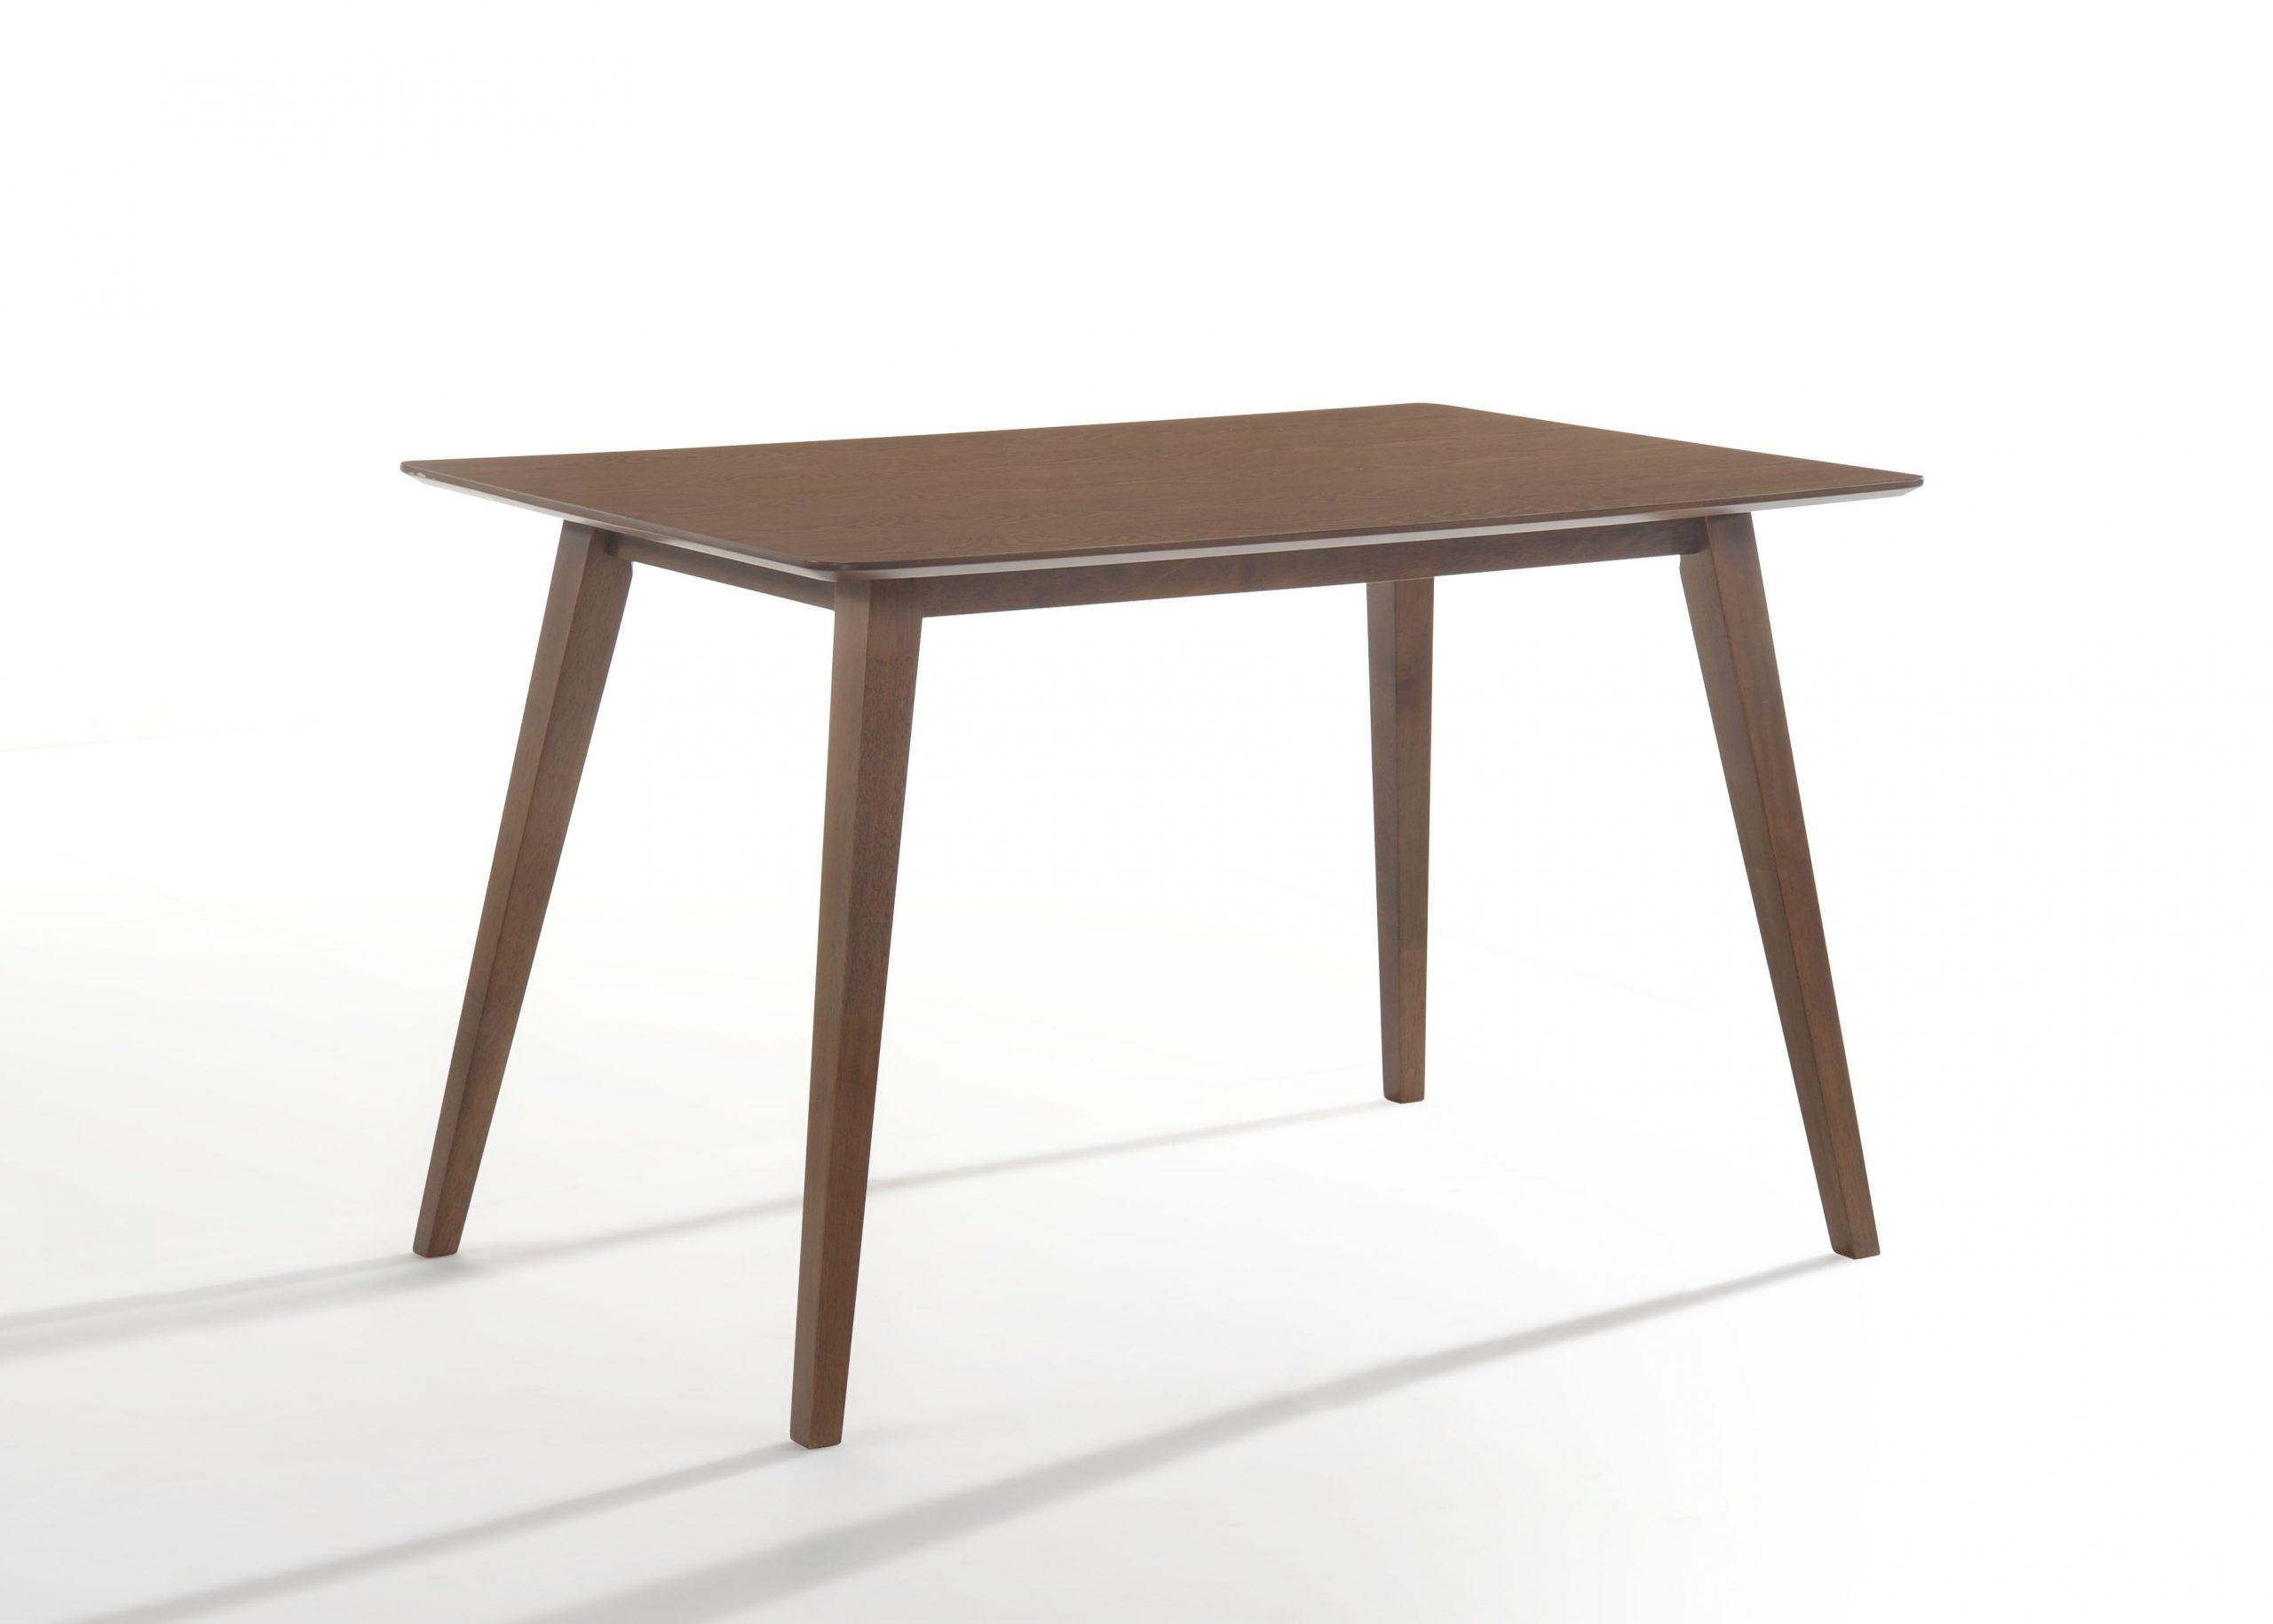 Mobiliya design - Masa -  MİT-3107  - 1